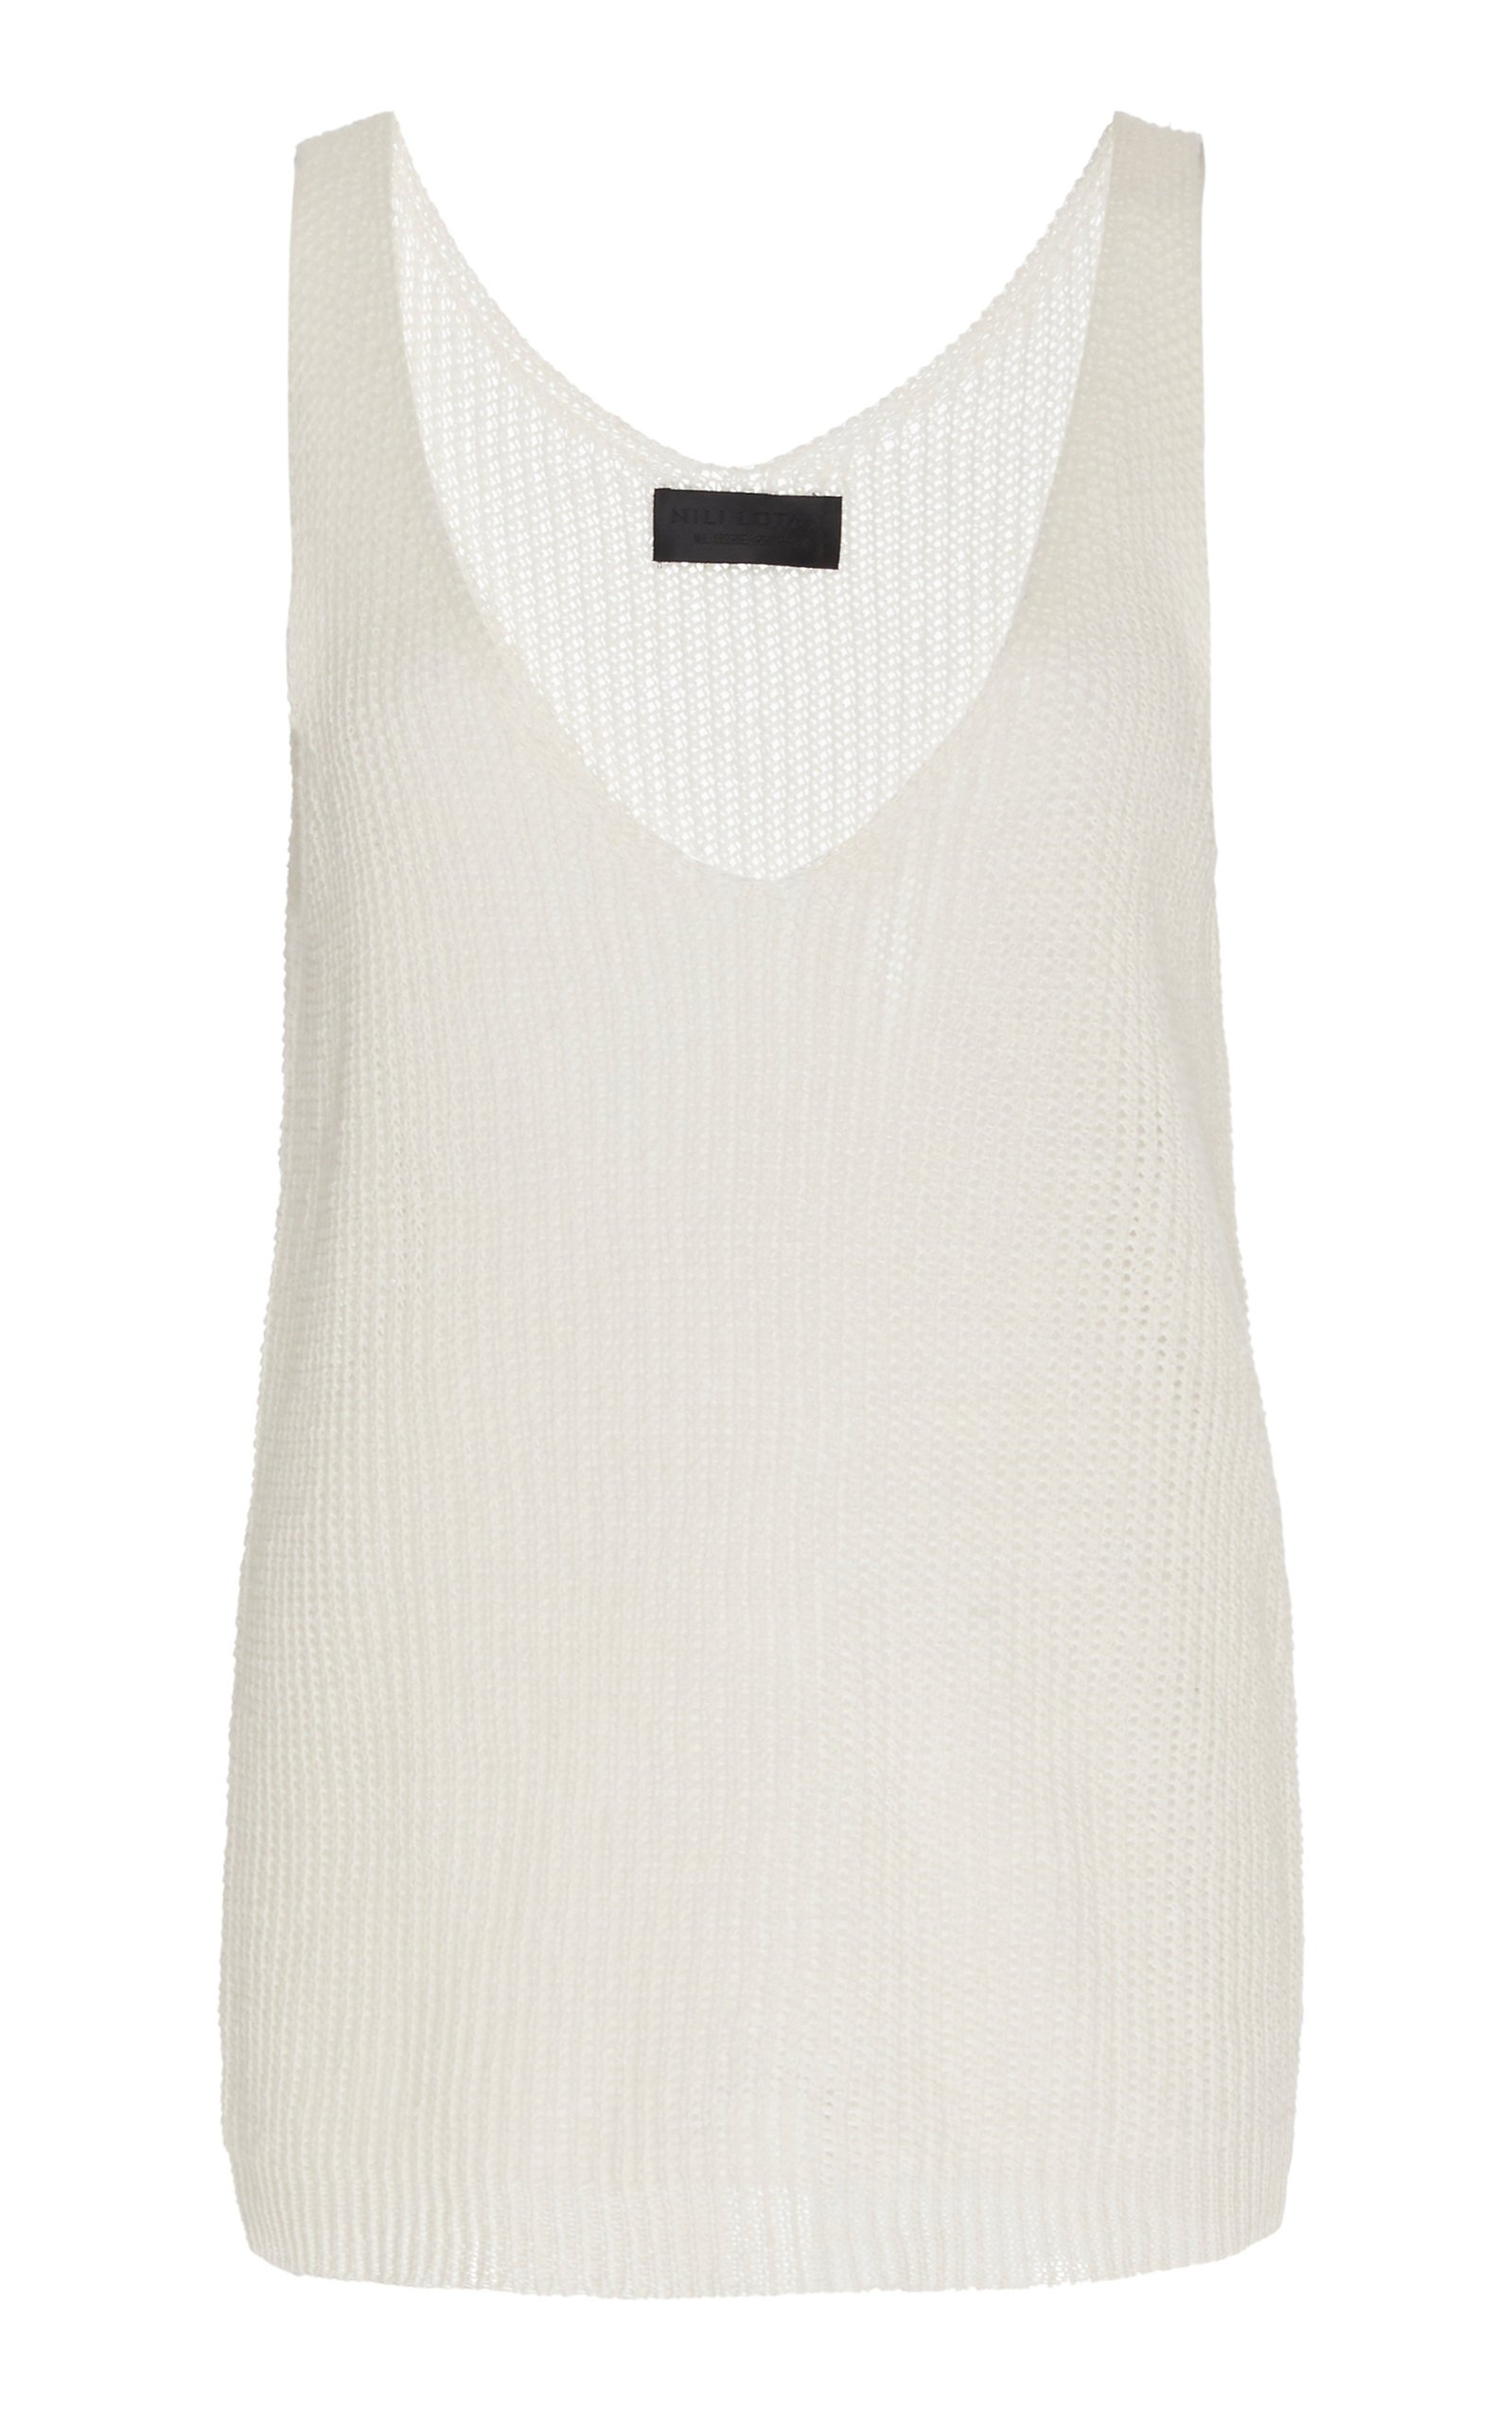 NILI LOTAN Nala Linen Sweater Size: L